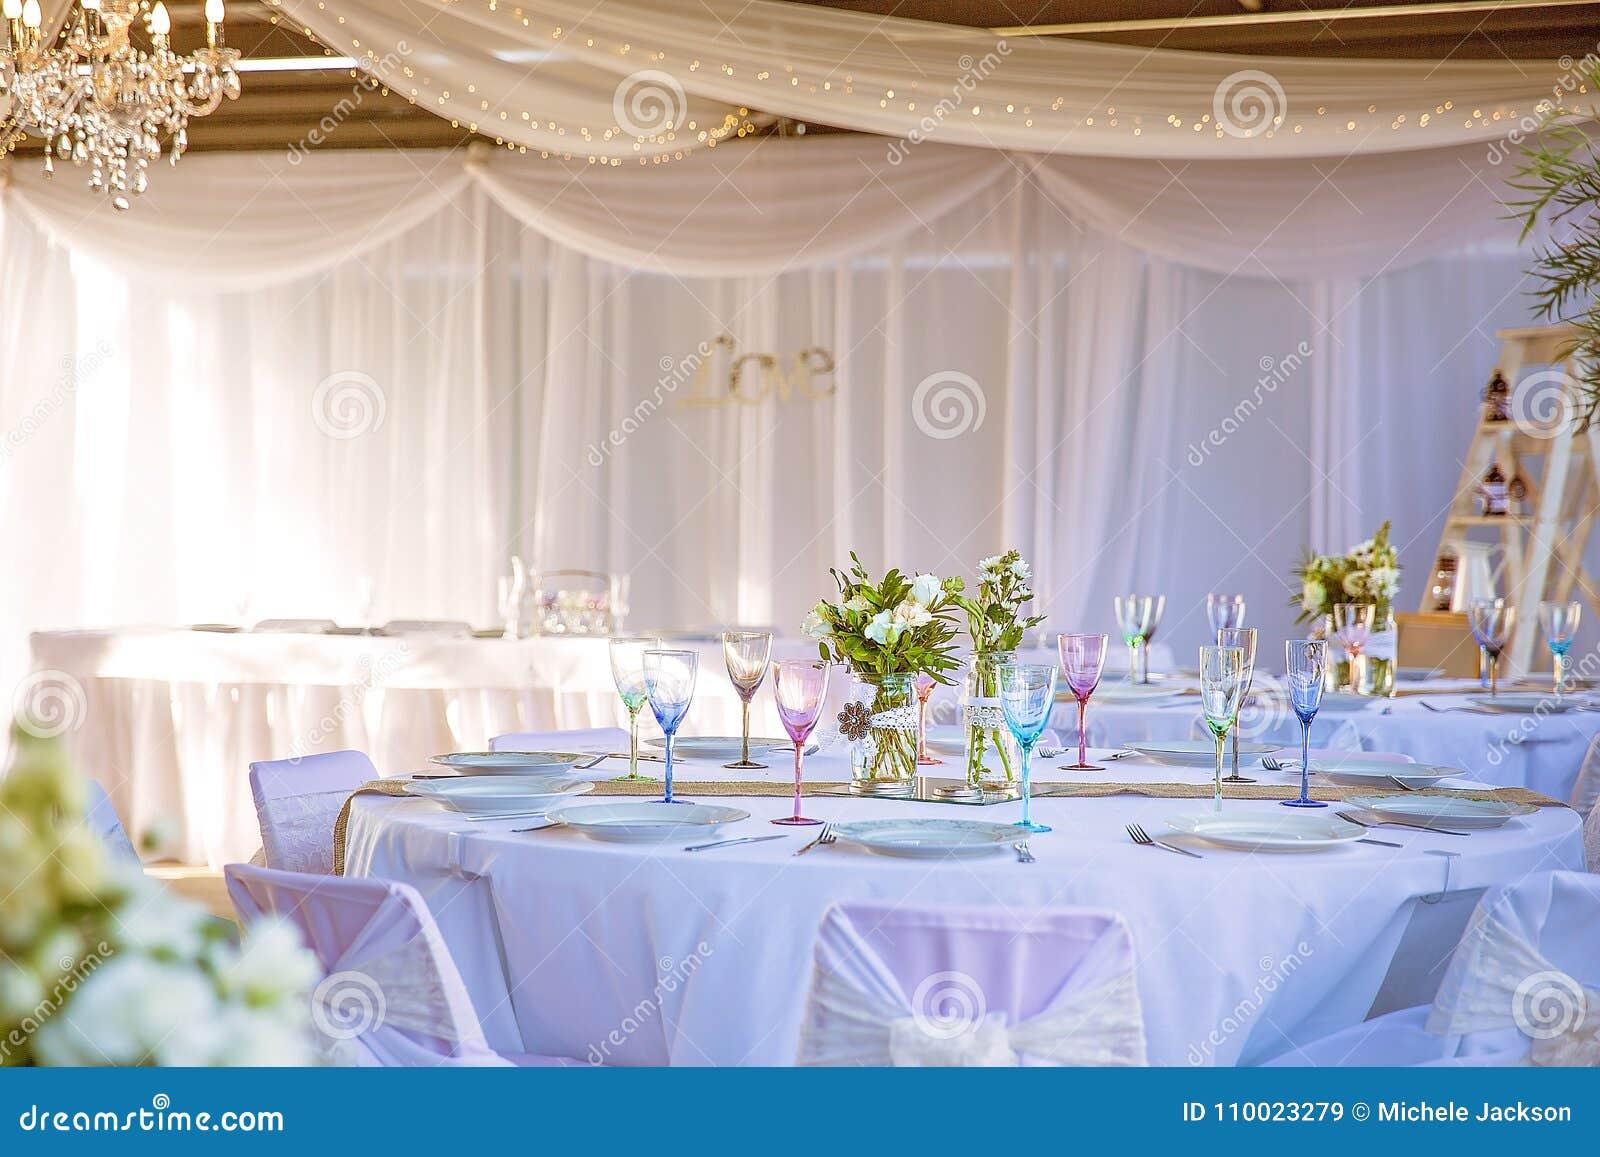 c513d8b83de6 Οργάνωση νυφικών και πινάκων υποδοχής για έναν γάμο που χρησιμοποιεί ένα  όμορφο μαλακό χρώμα σχεδίου κρητιδογραφιών Χαρακτηρίζει μαλακά το ντυμένο  και ...